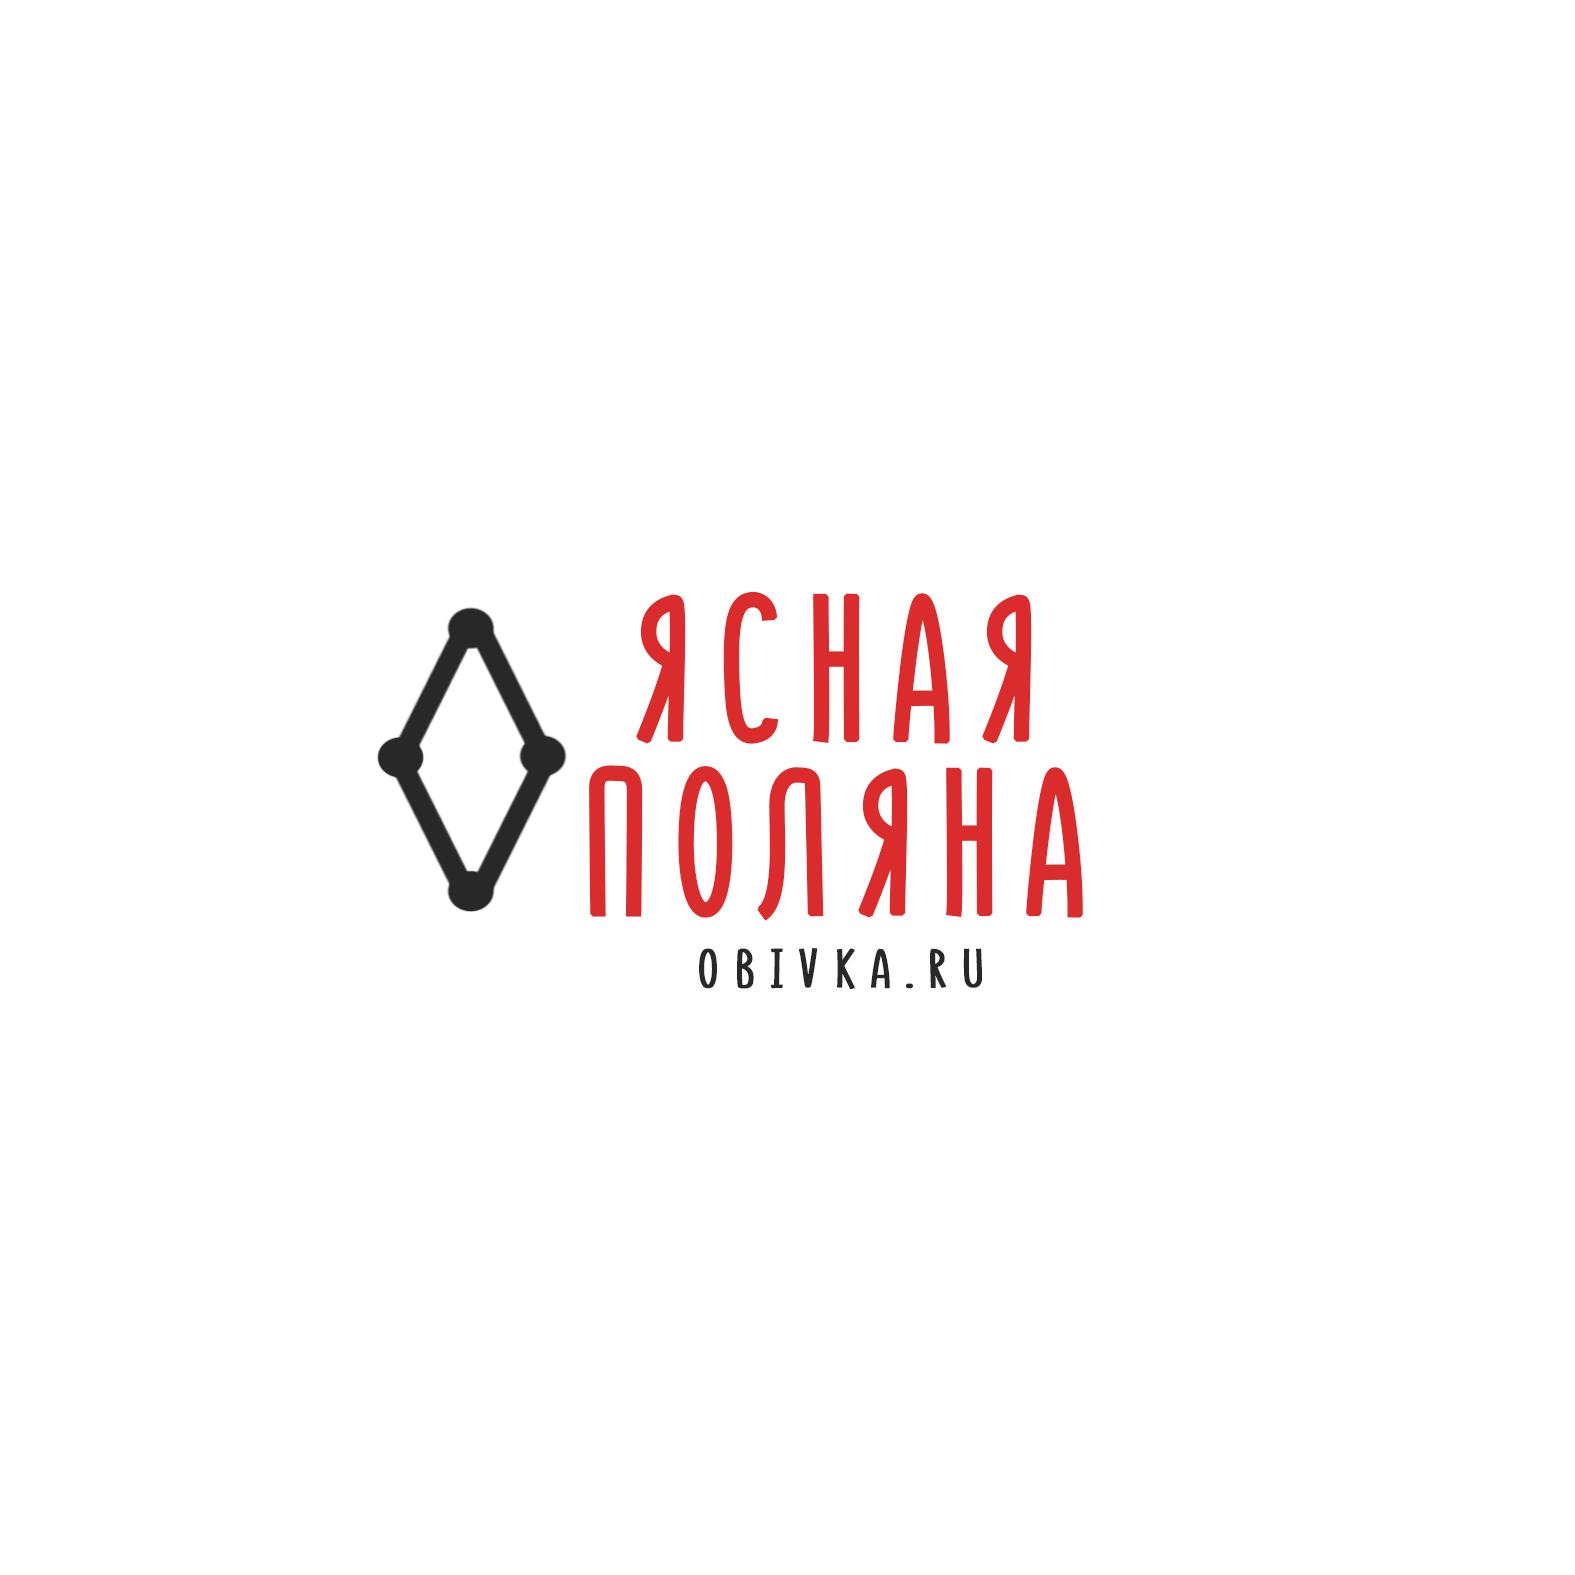 Логотип для сайта OBIVKA.RU фото f_2025c11138e98b29.jpg